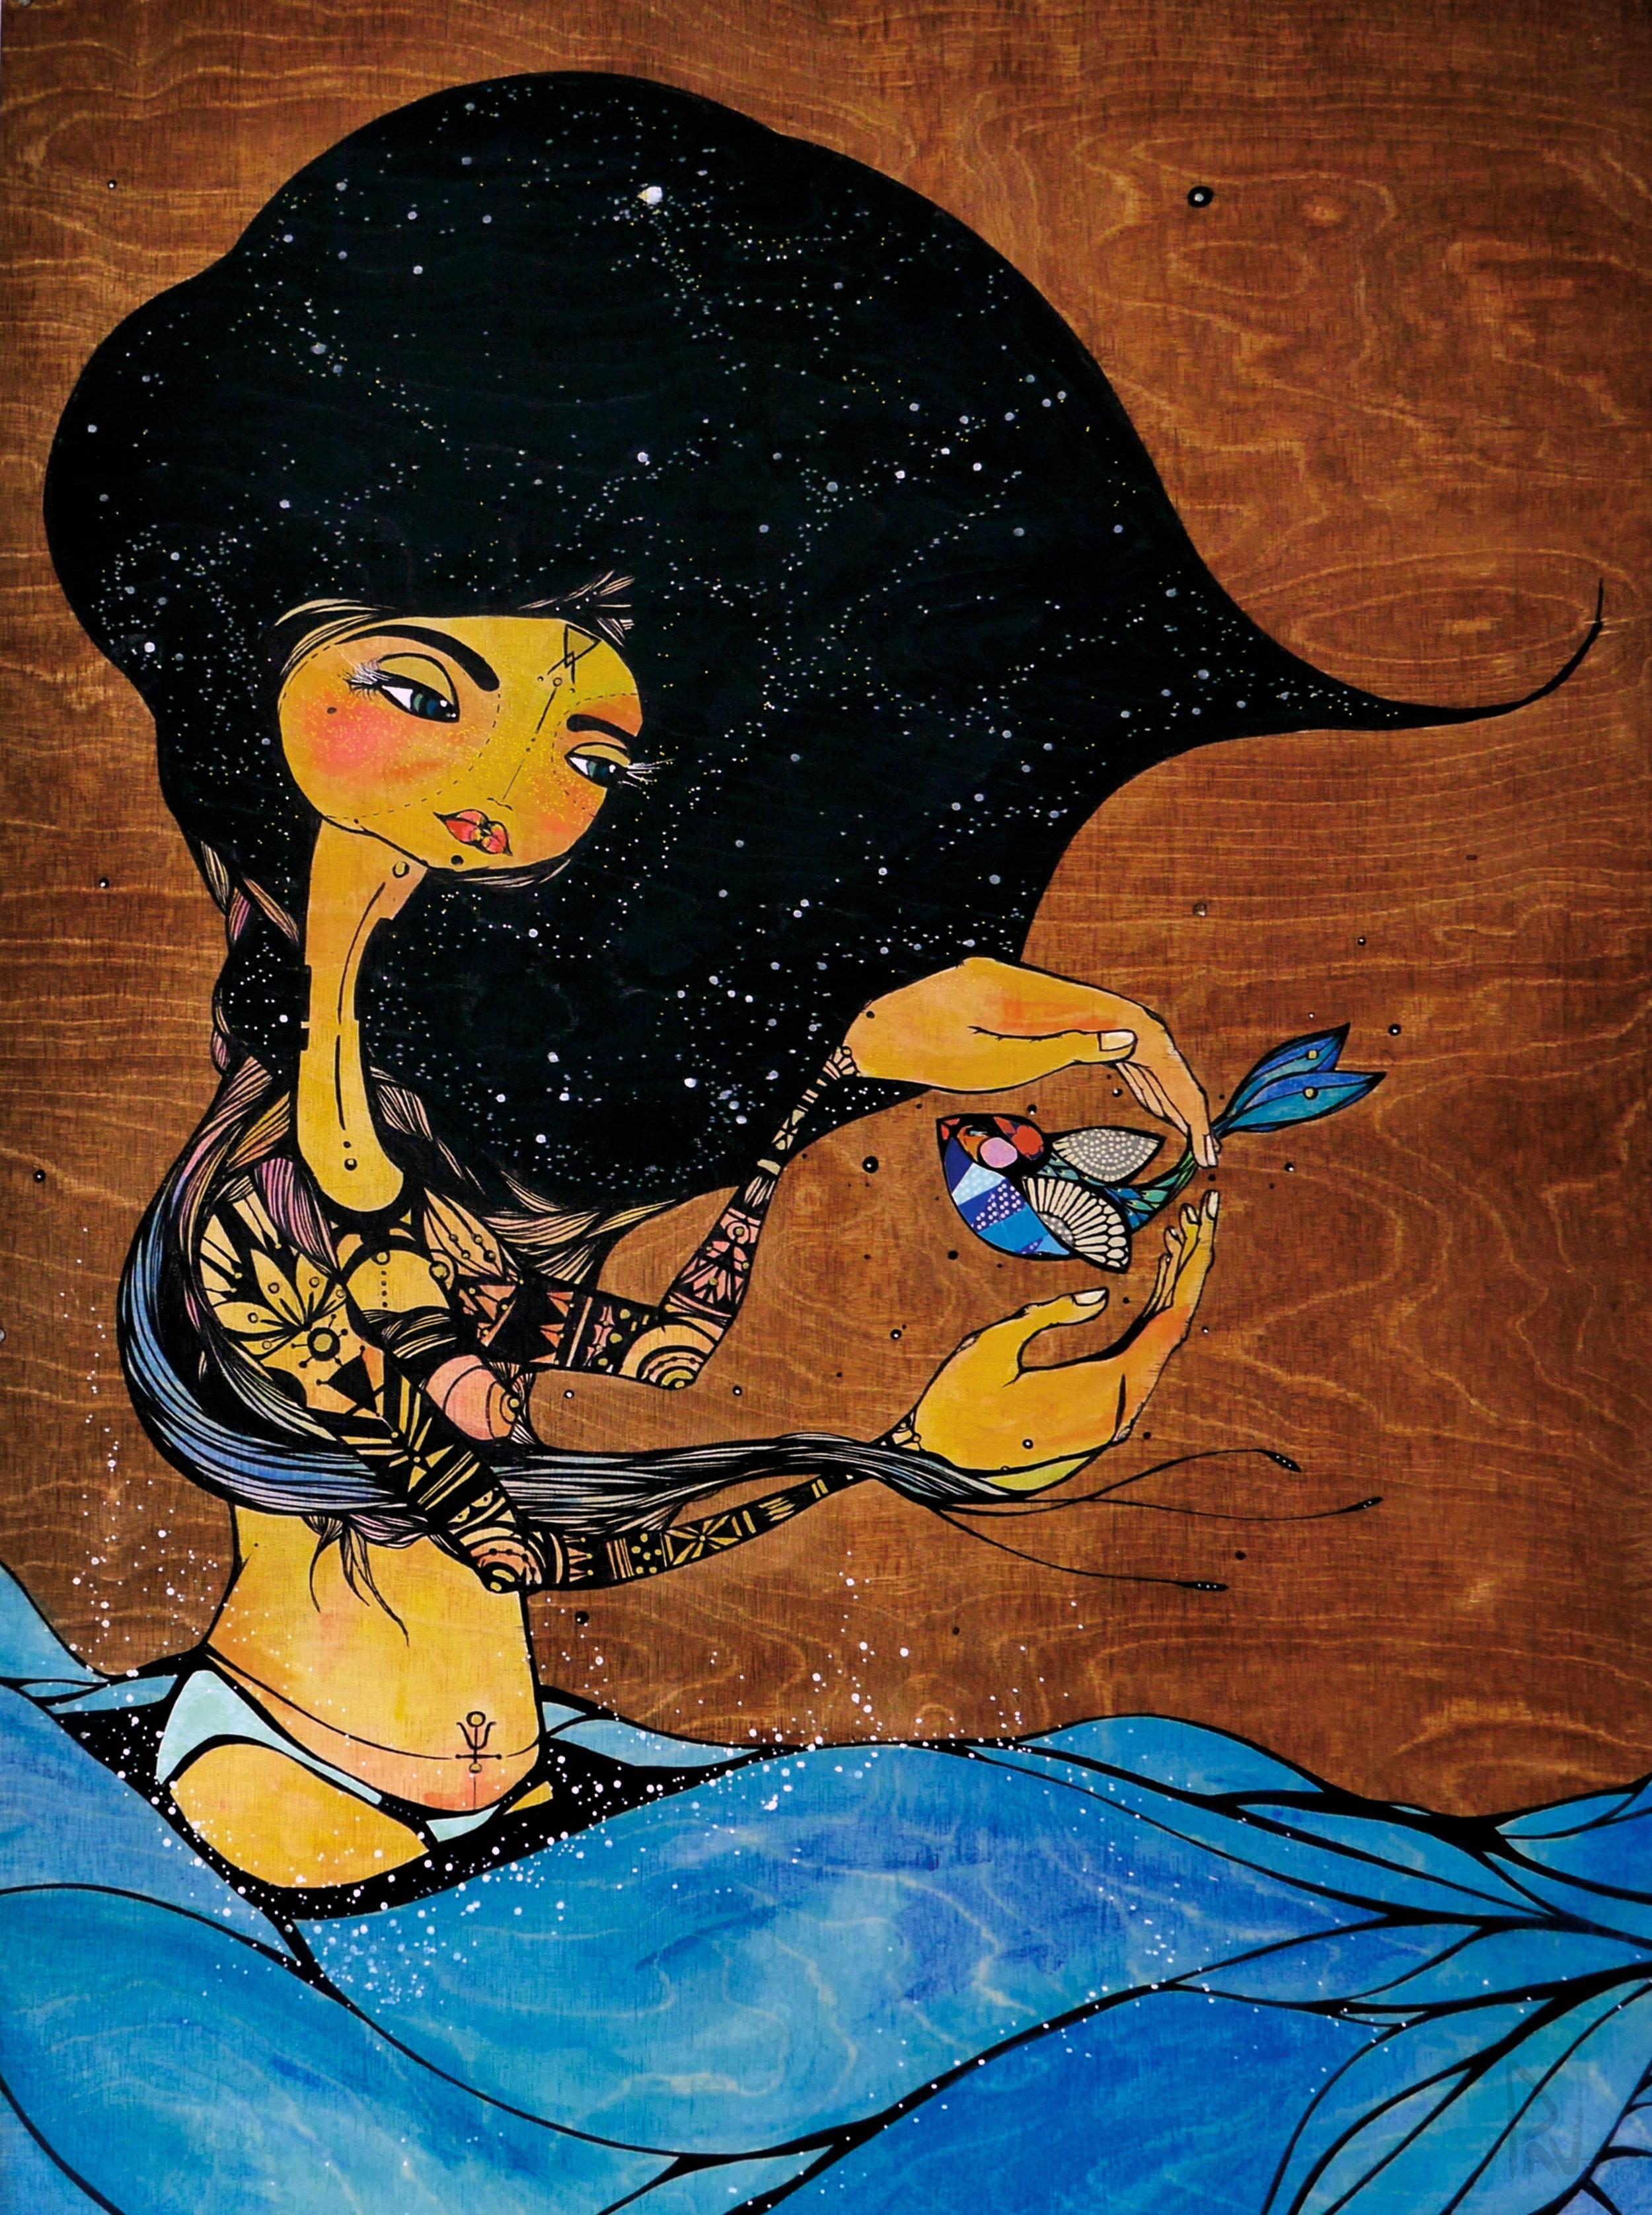 NAKAI (Coming Full Circle Series) 2013   | 61x102 cm |Mixed Media on Wood